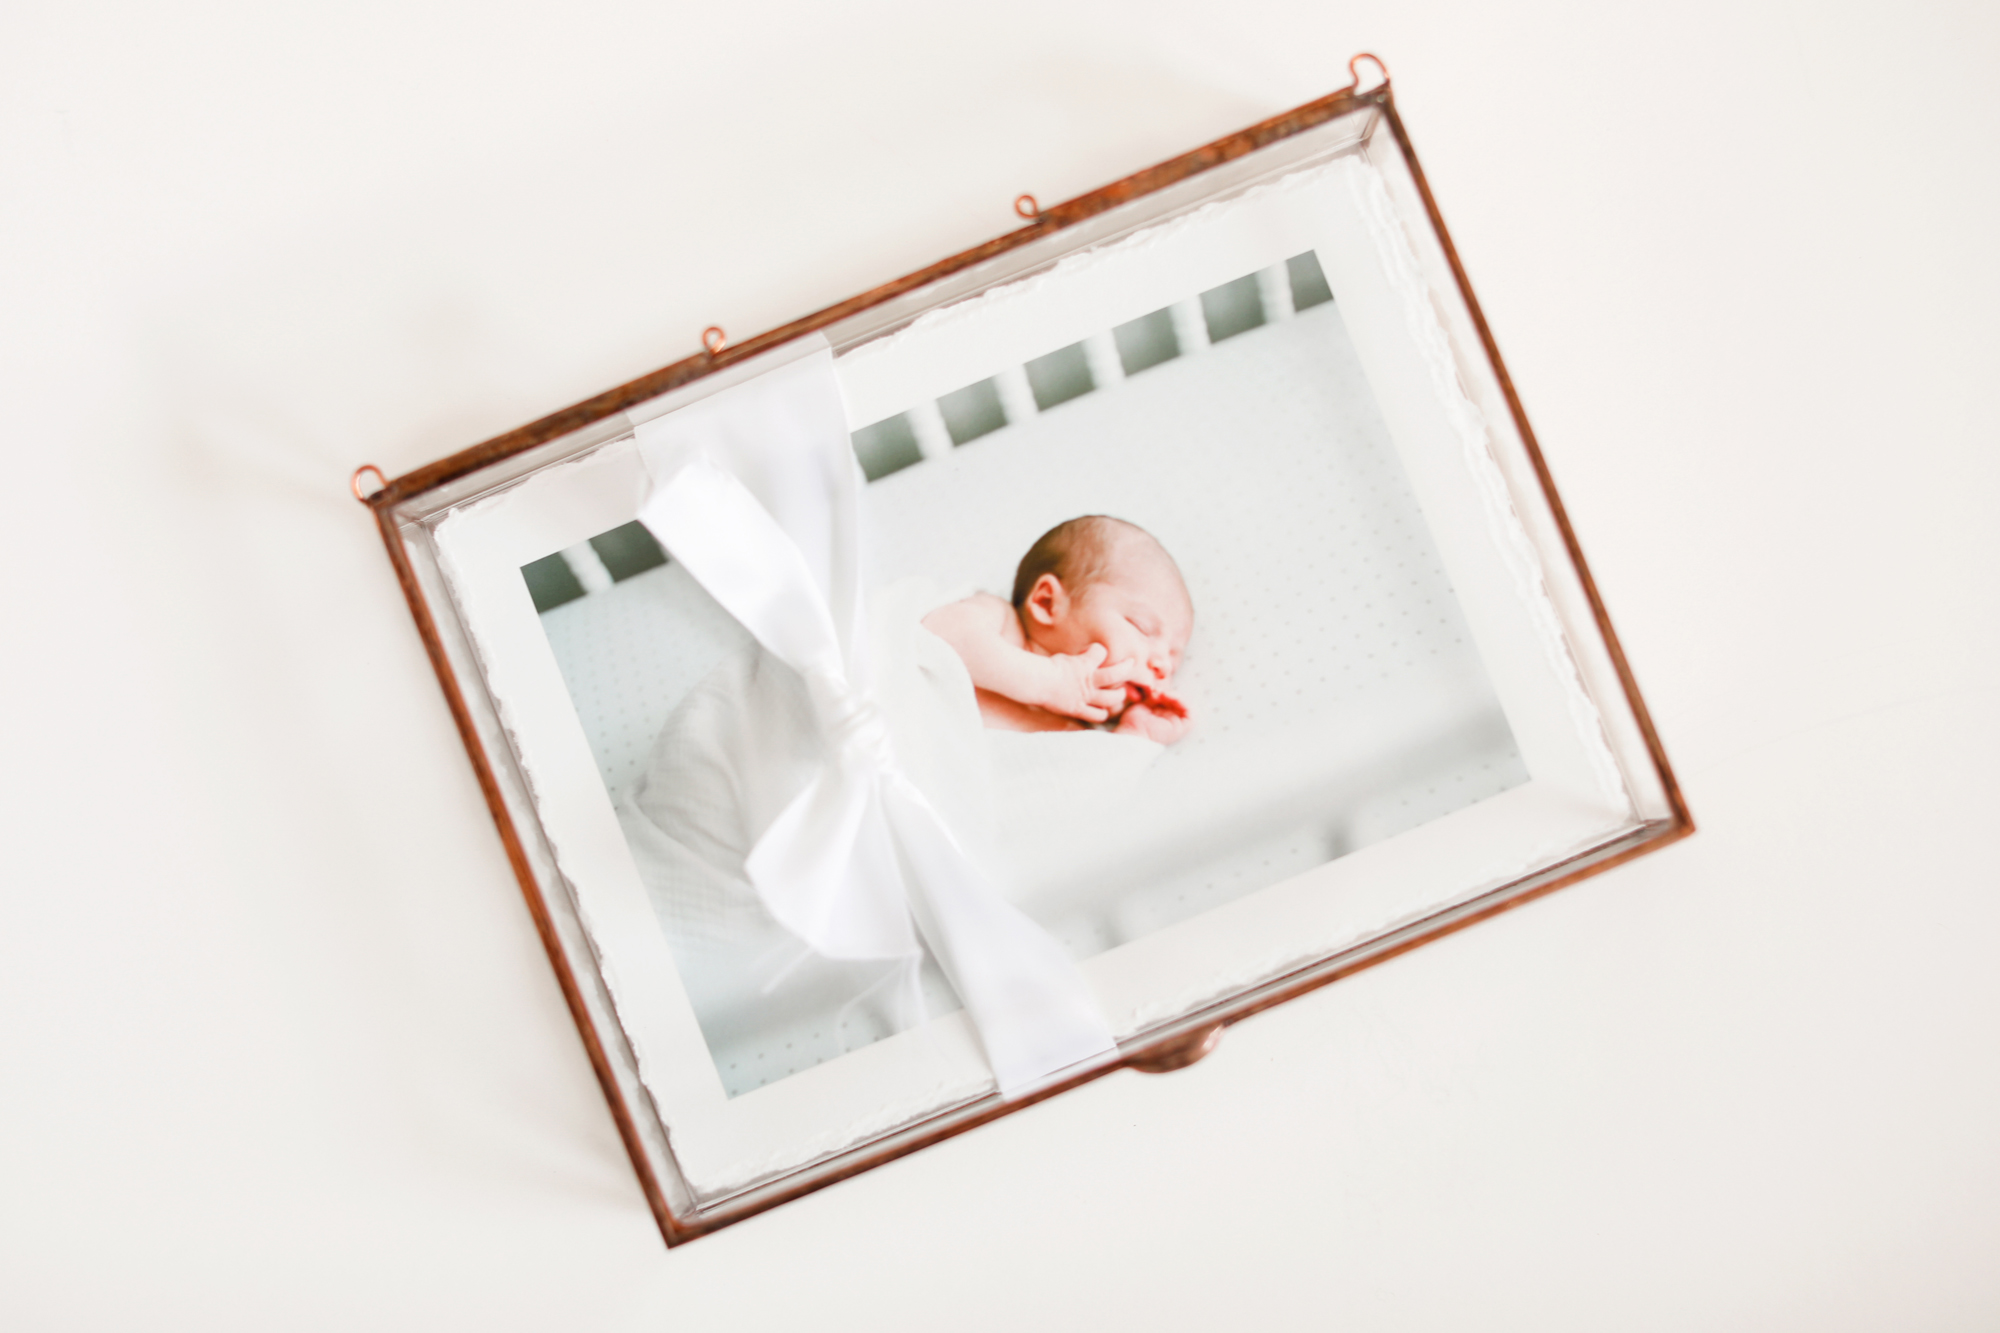 raleigh-lifestyle-newborn-film-photographer-albums-baby-books-004